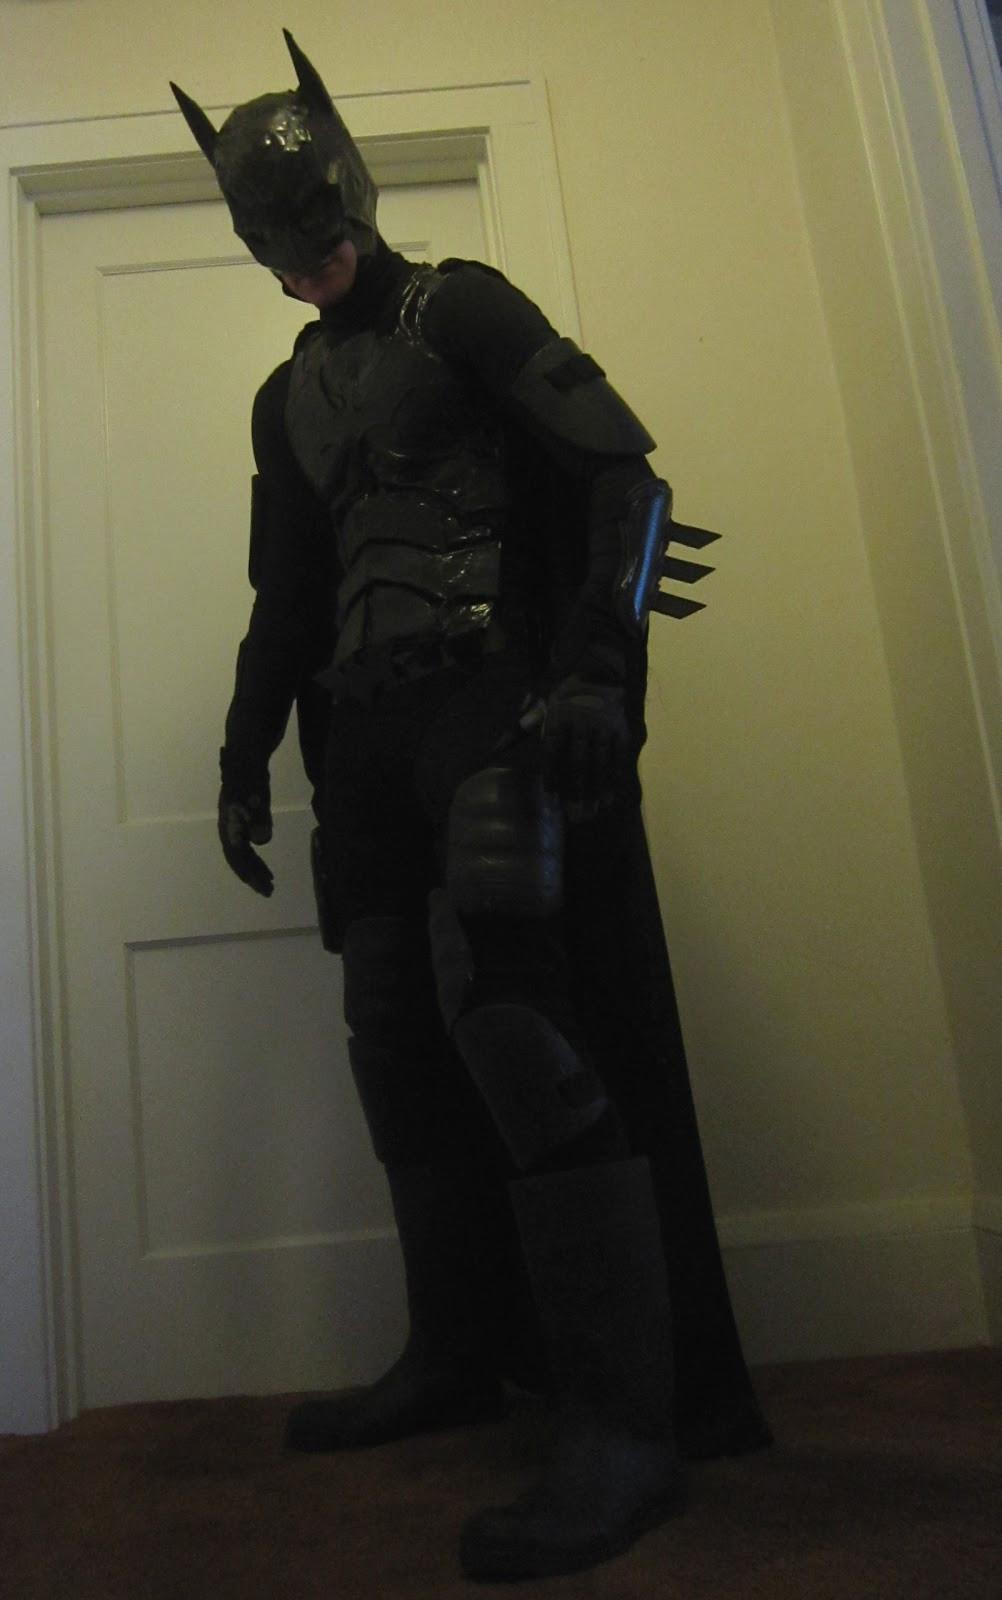 Best ideas about DIY Batman Costume . Save or Pin Chuck Does Art DIY Batman Costume Now.